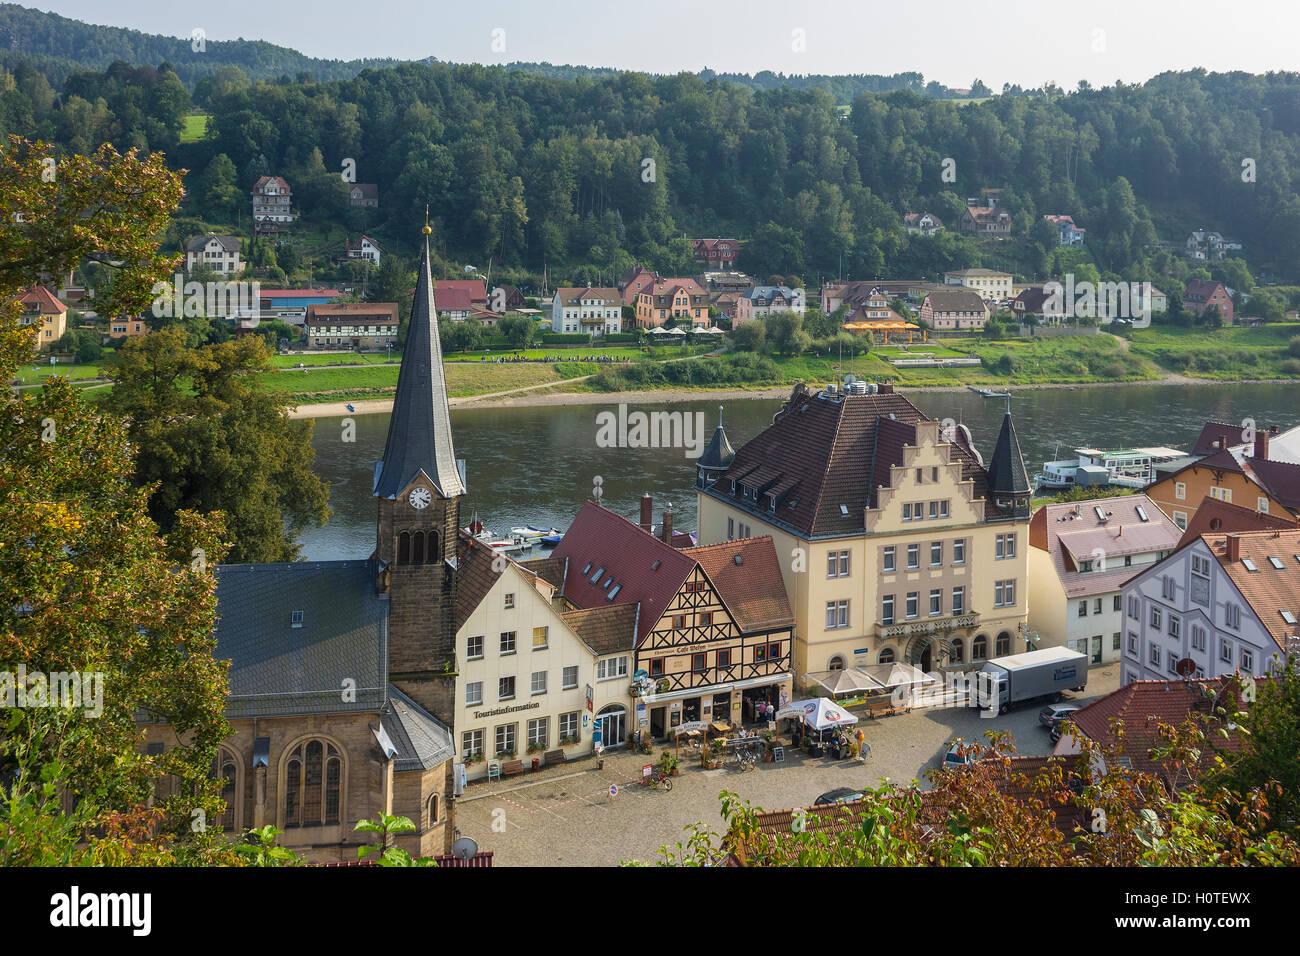 Germany, Saxony, Stadt Wehlen & River Elbe - Stock Image